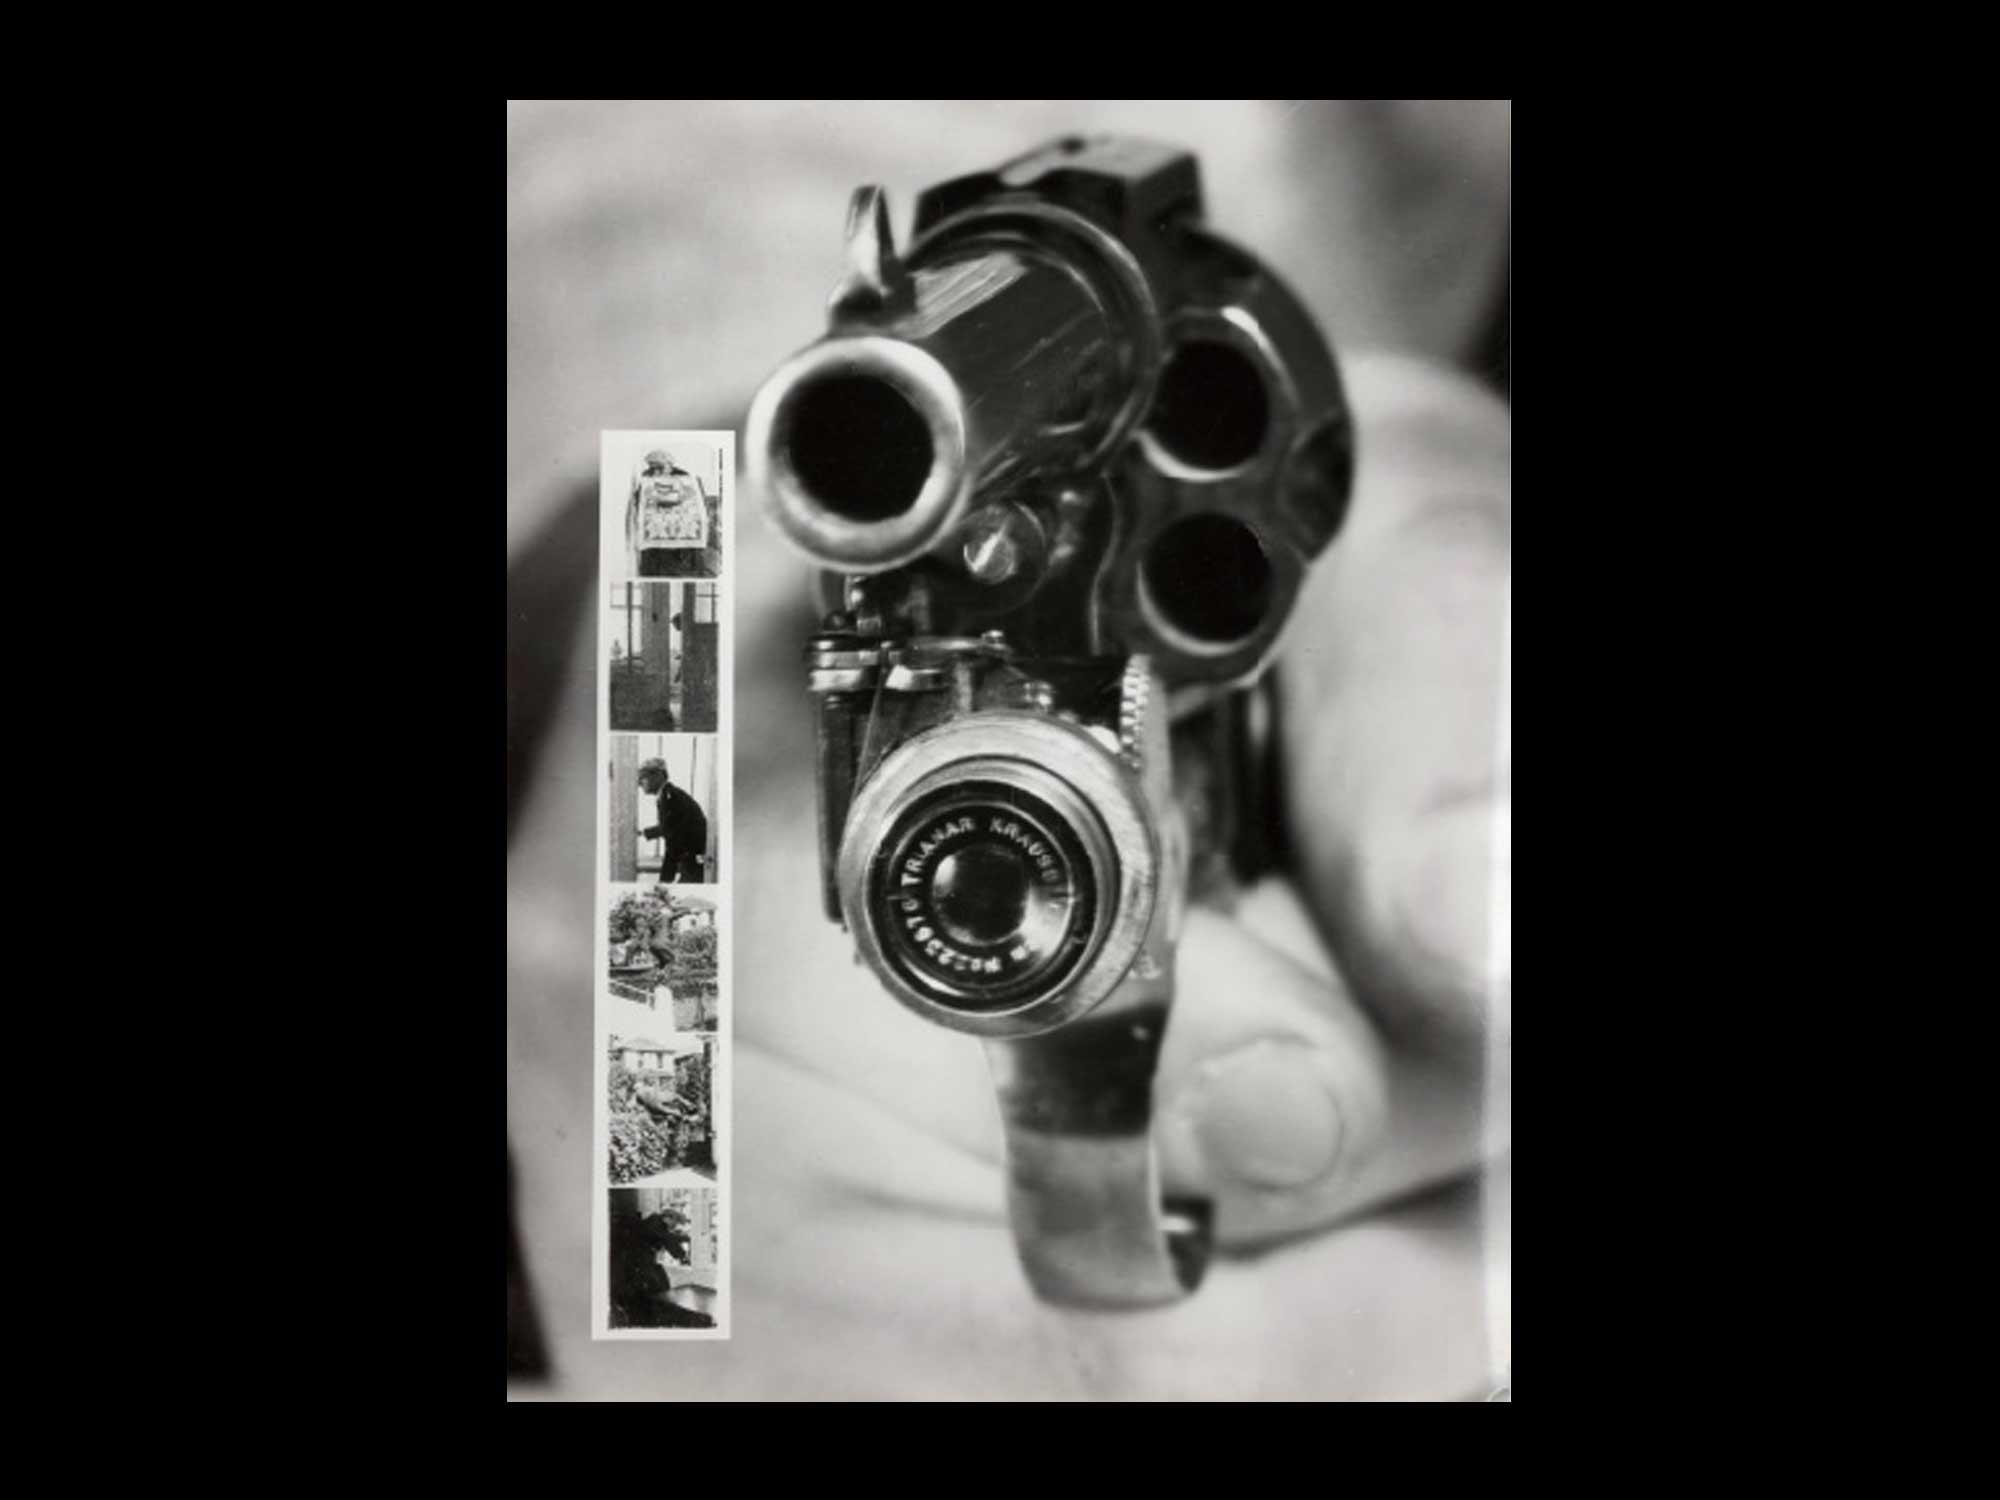 revolver camera main image